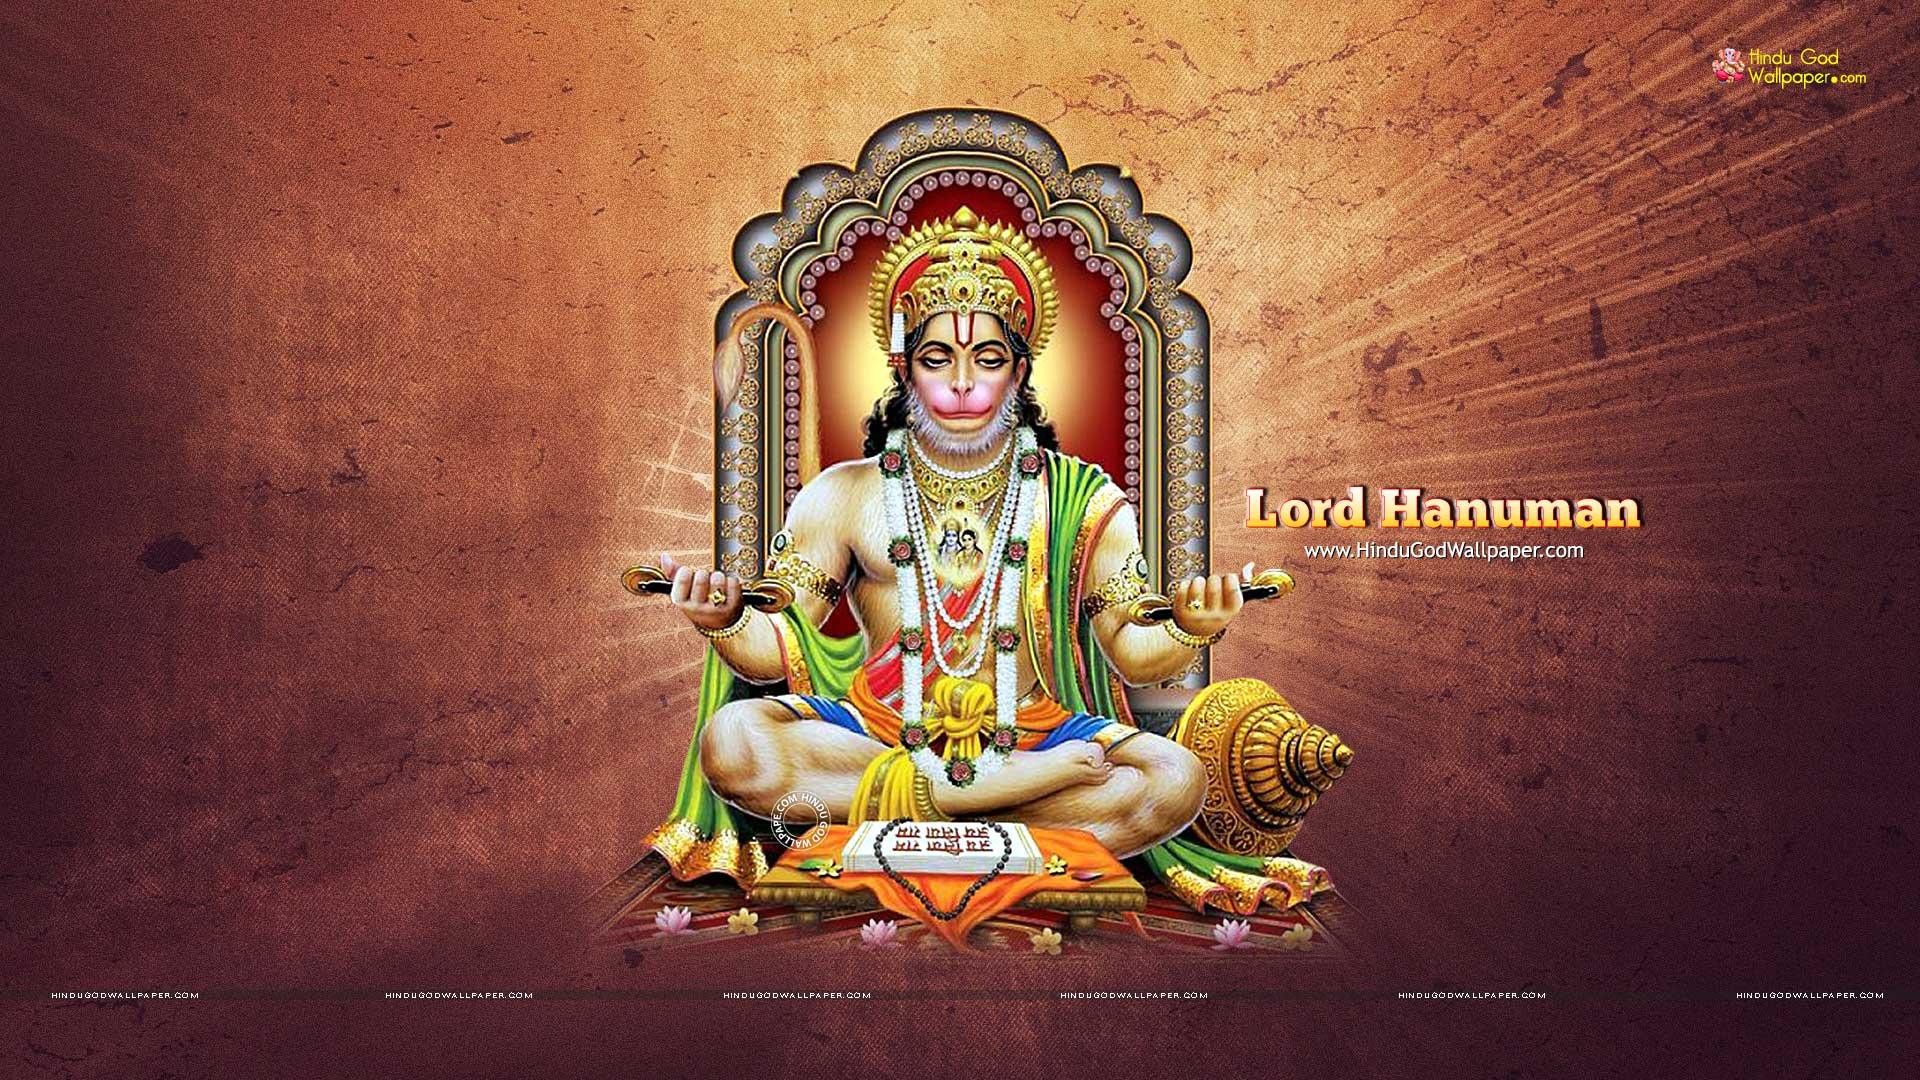 Hd wallpaper of hanuman - Hd Wallpaper Of Hanuman Hd Wallpaper Of Hanuman Hanuman Ji Photos